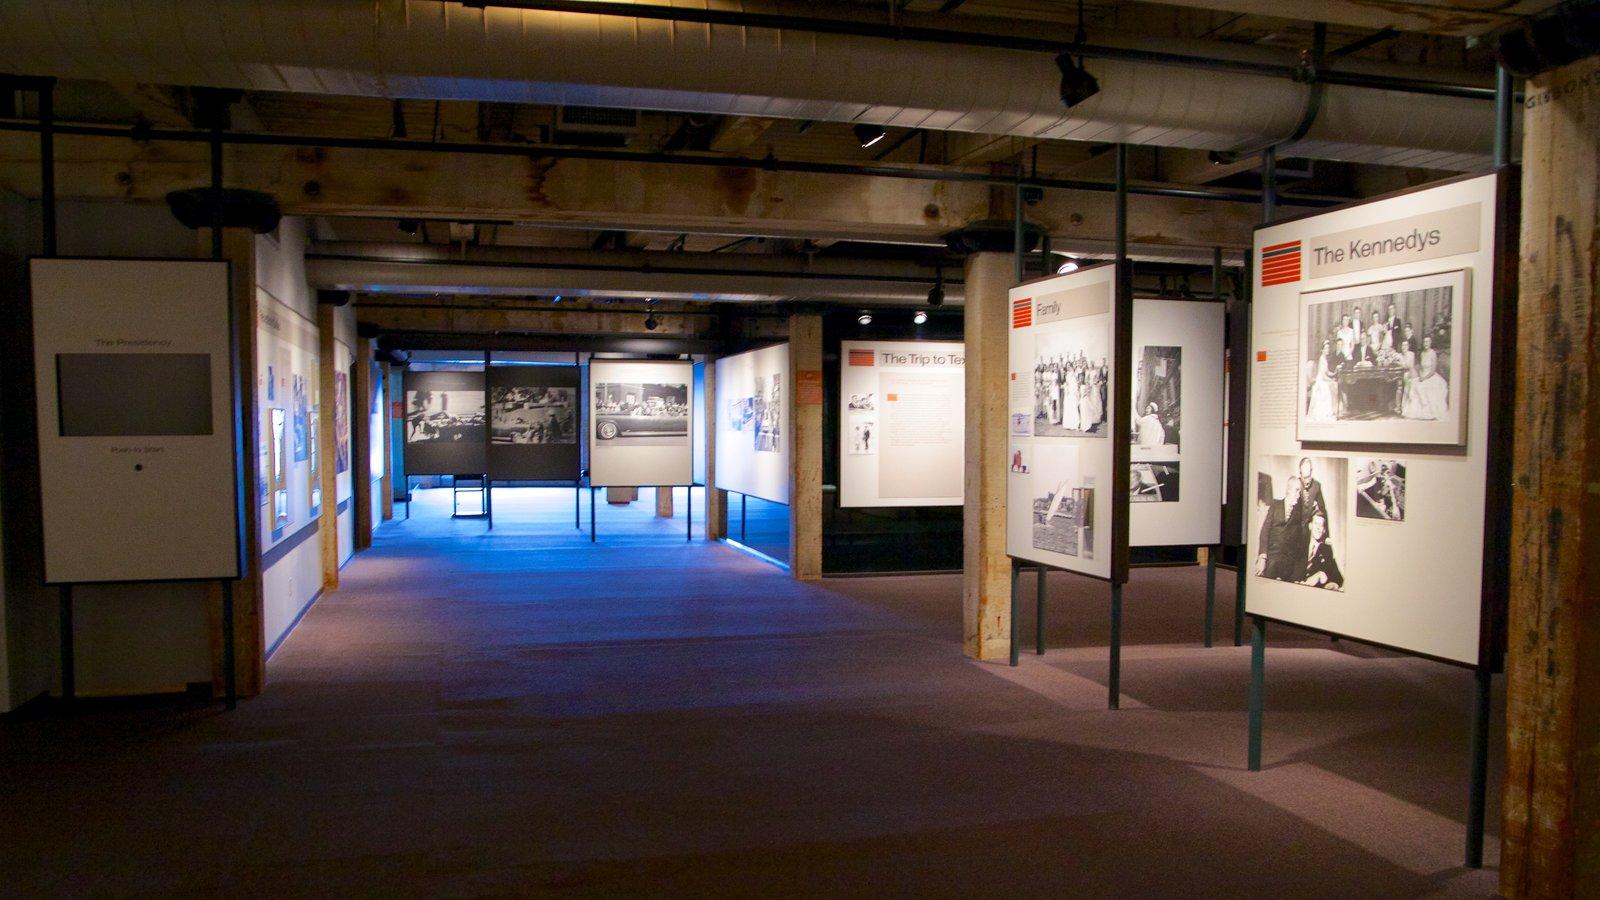 Sixth Floor Museum Featuring Interior Views